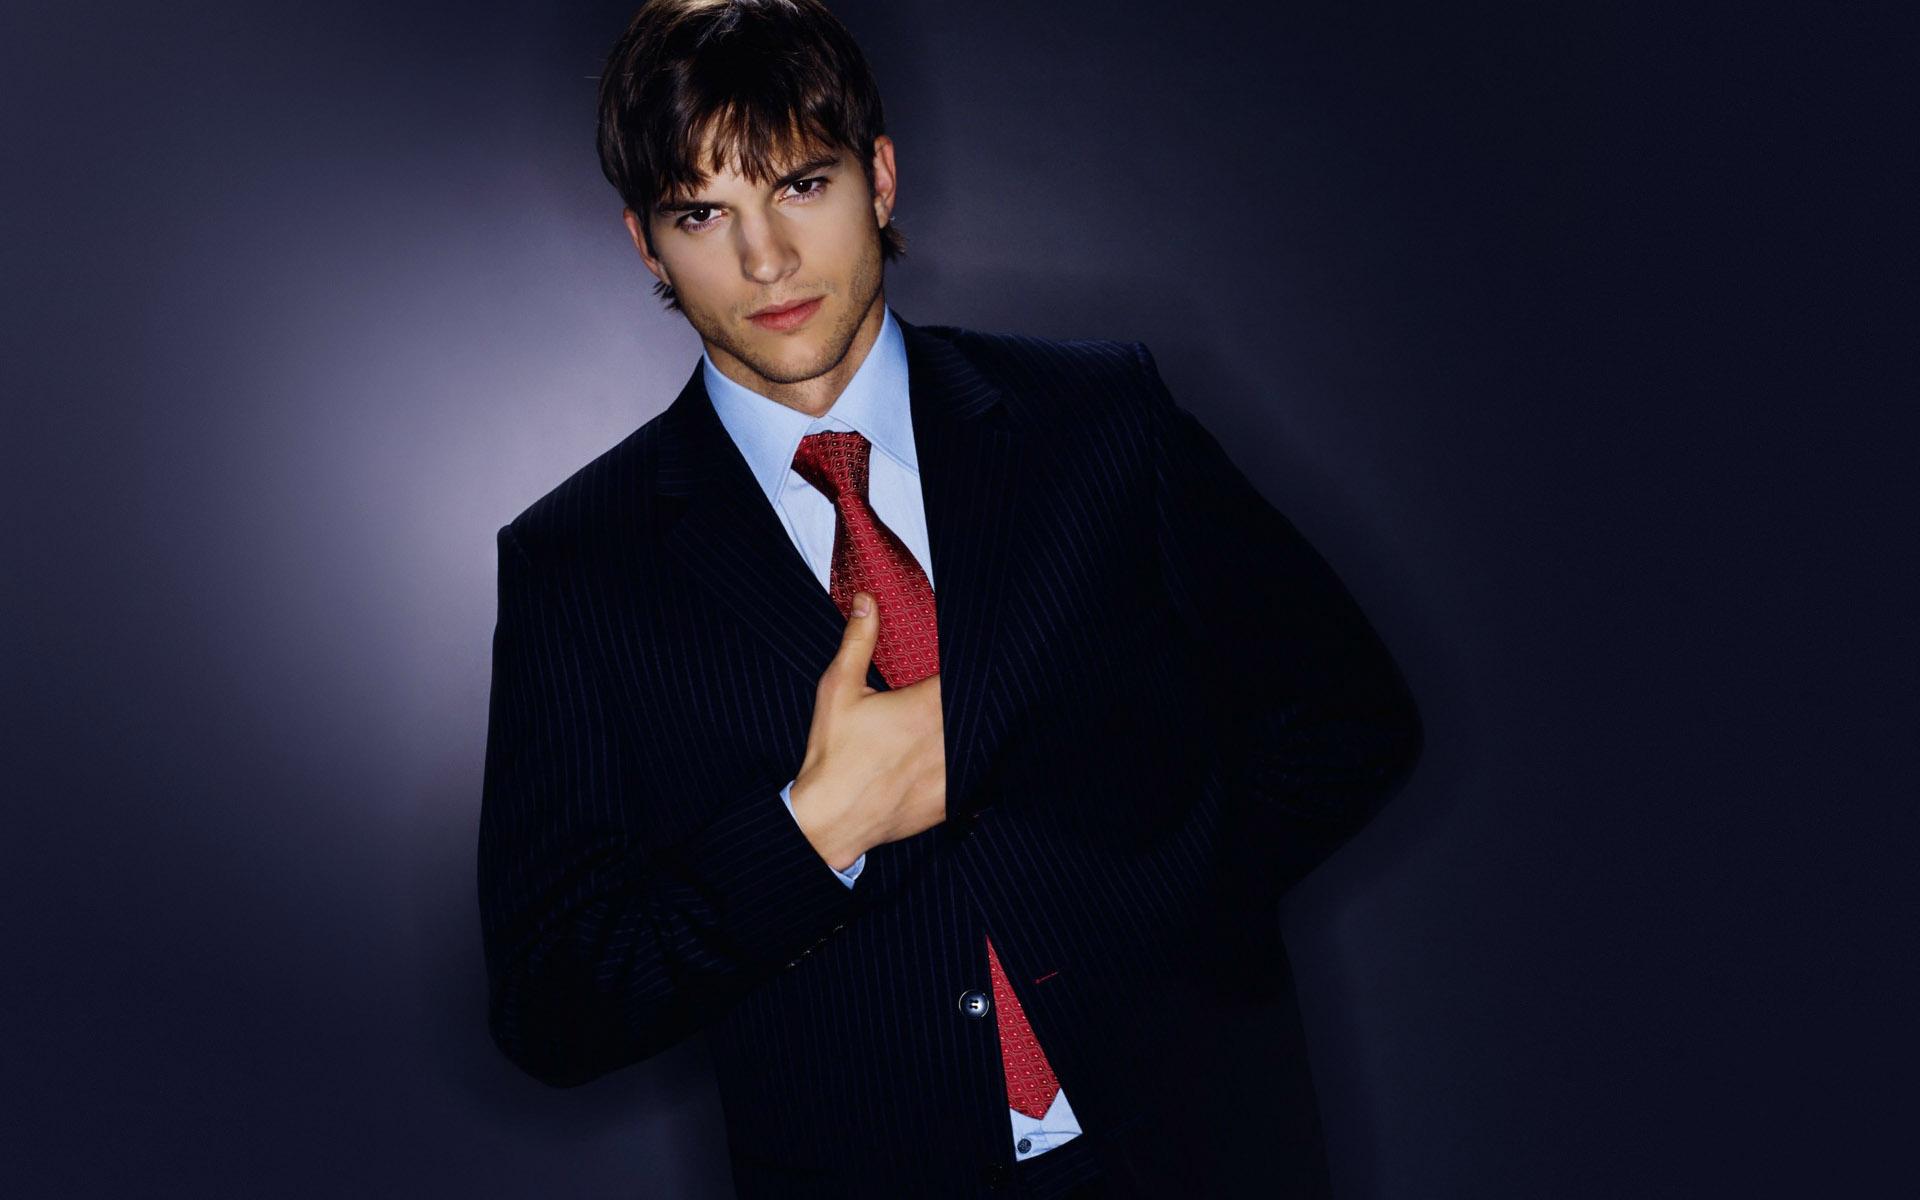 Ashton Kutcher HD Wallpaper Background Image 1920x1200 ID 1920x1200